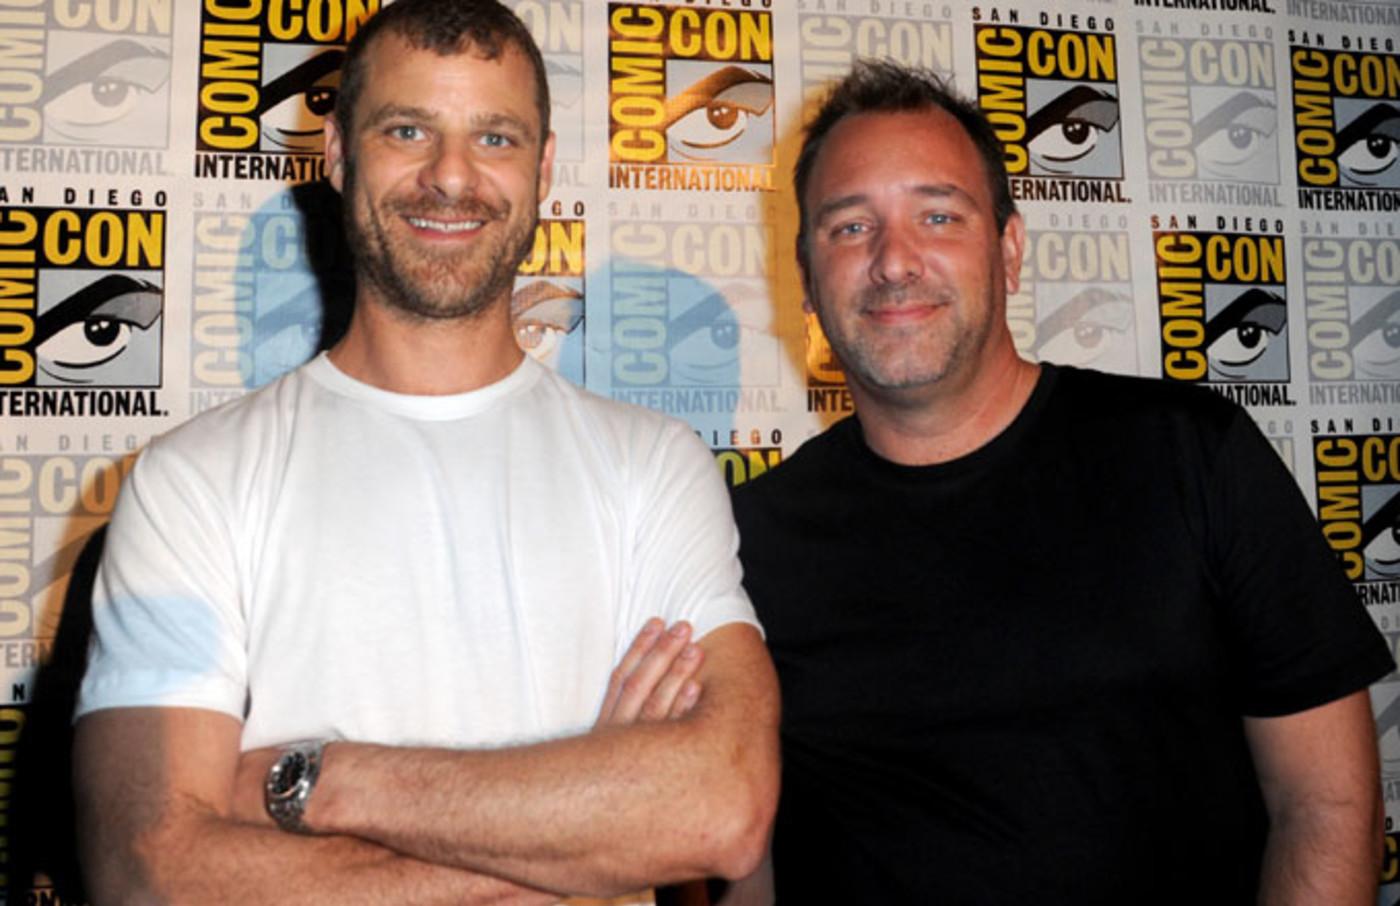 Matt Stone (L) with Trey Parker at Comic Con